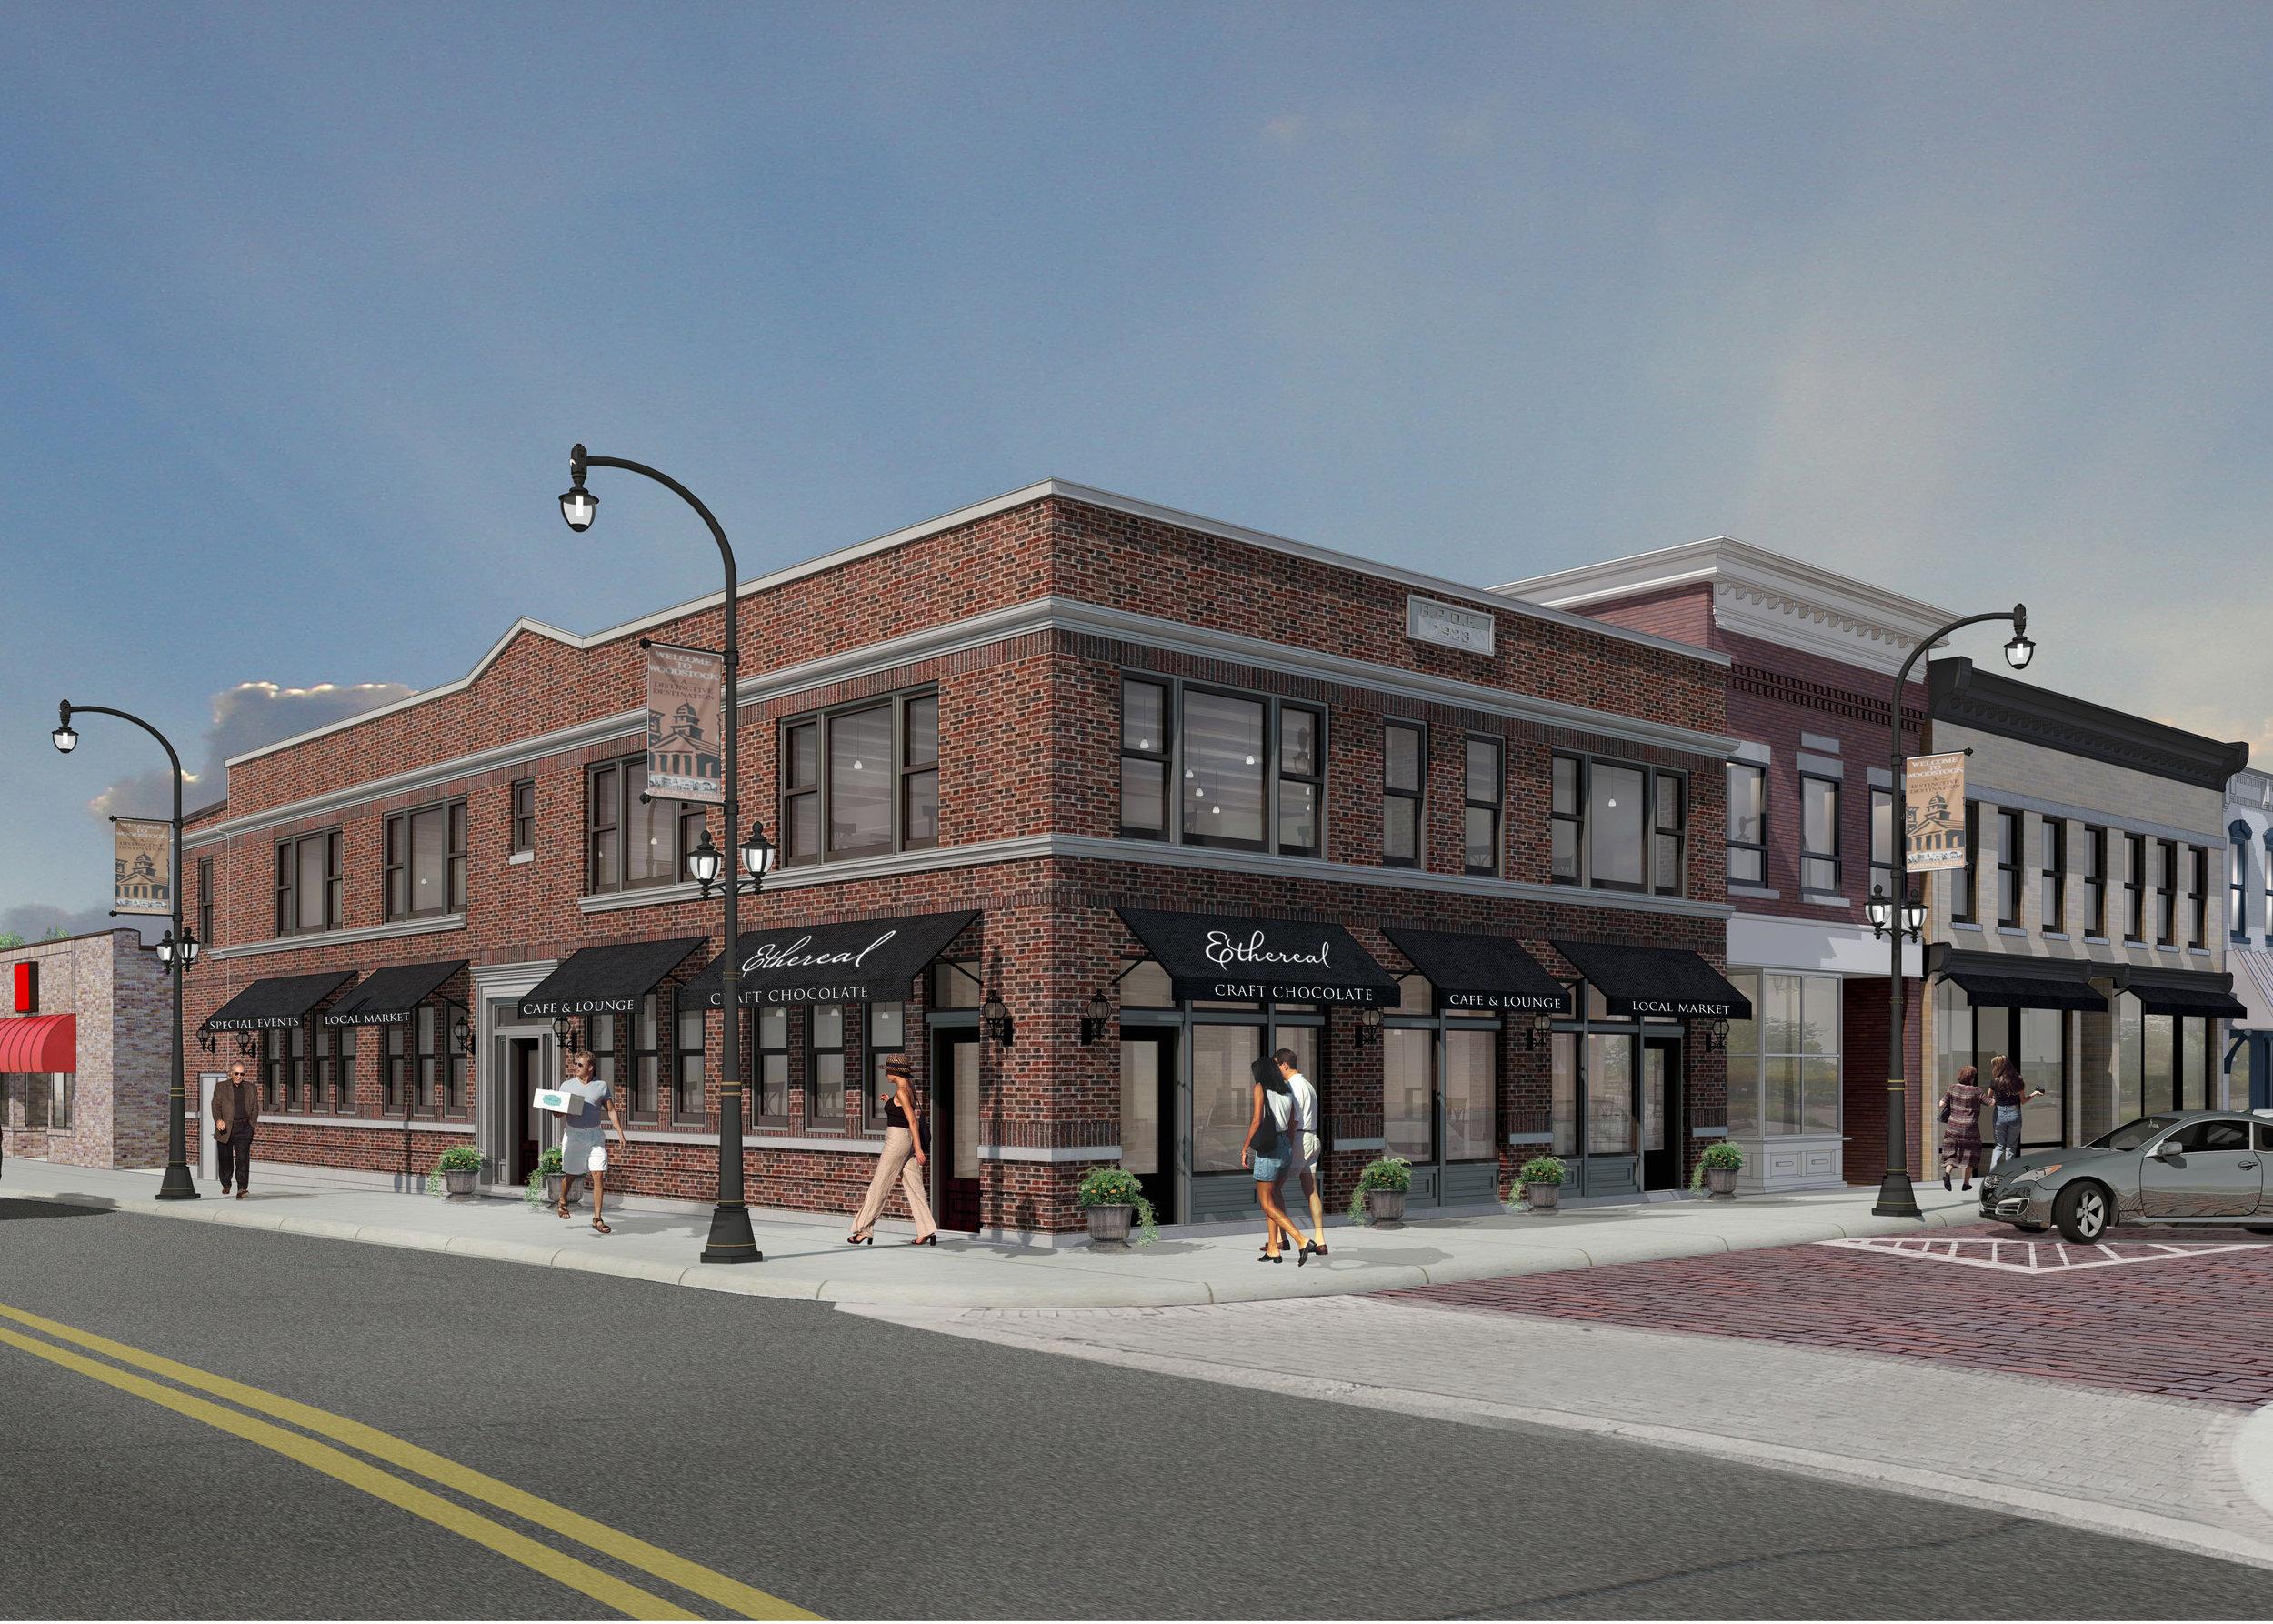 140cass street exterior color rendering-streetscape2a.jpg